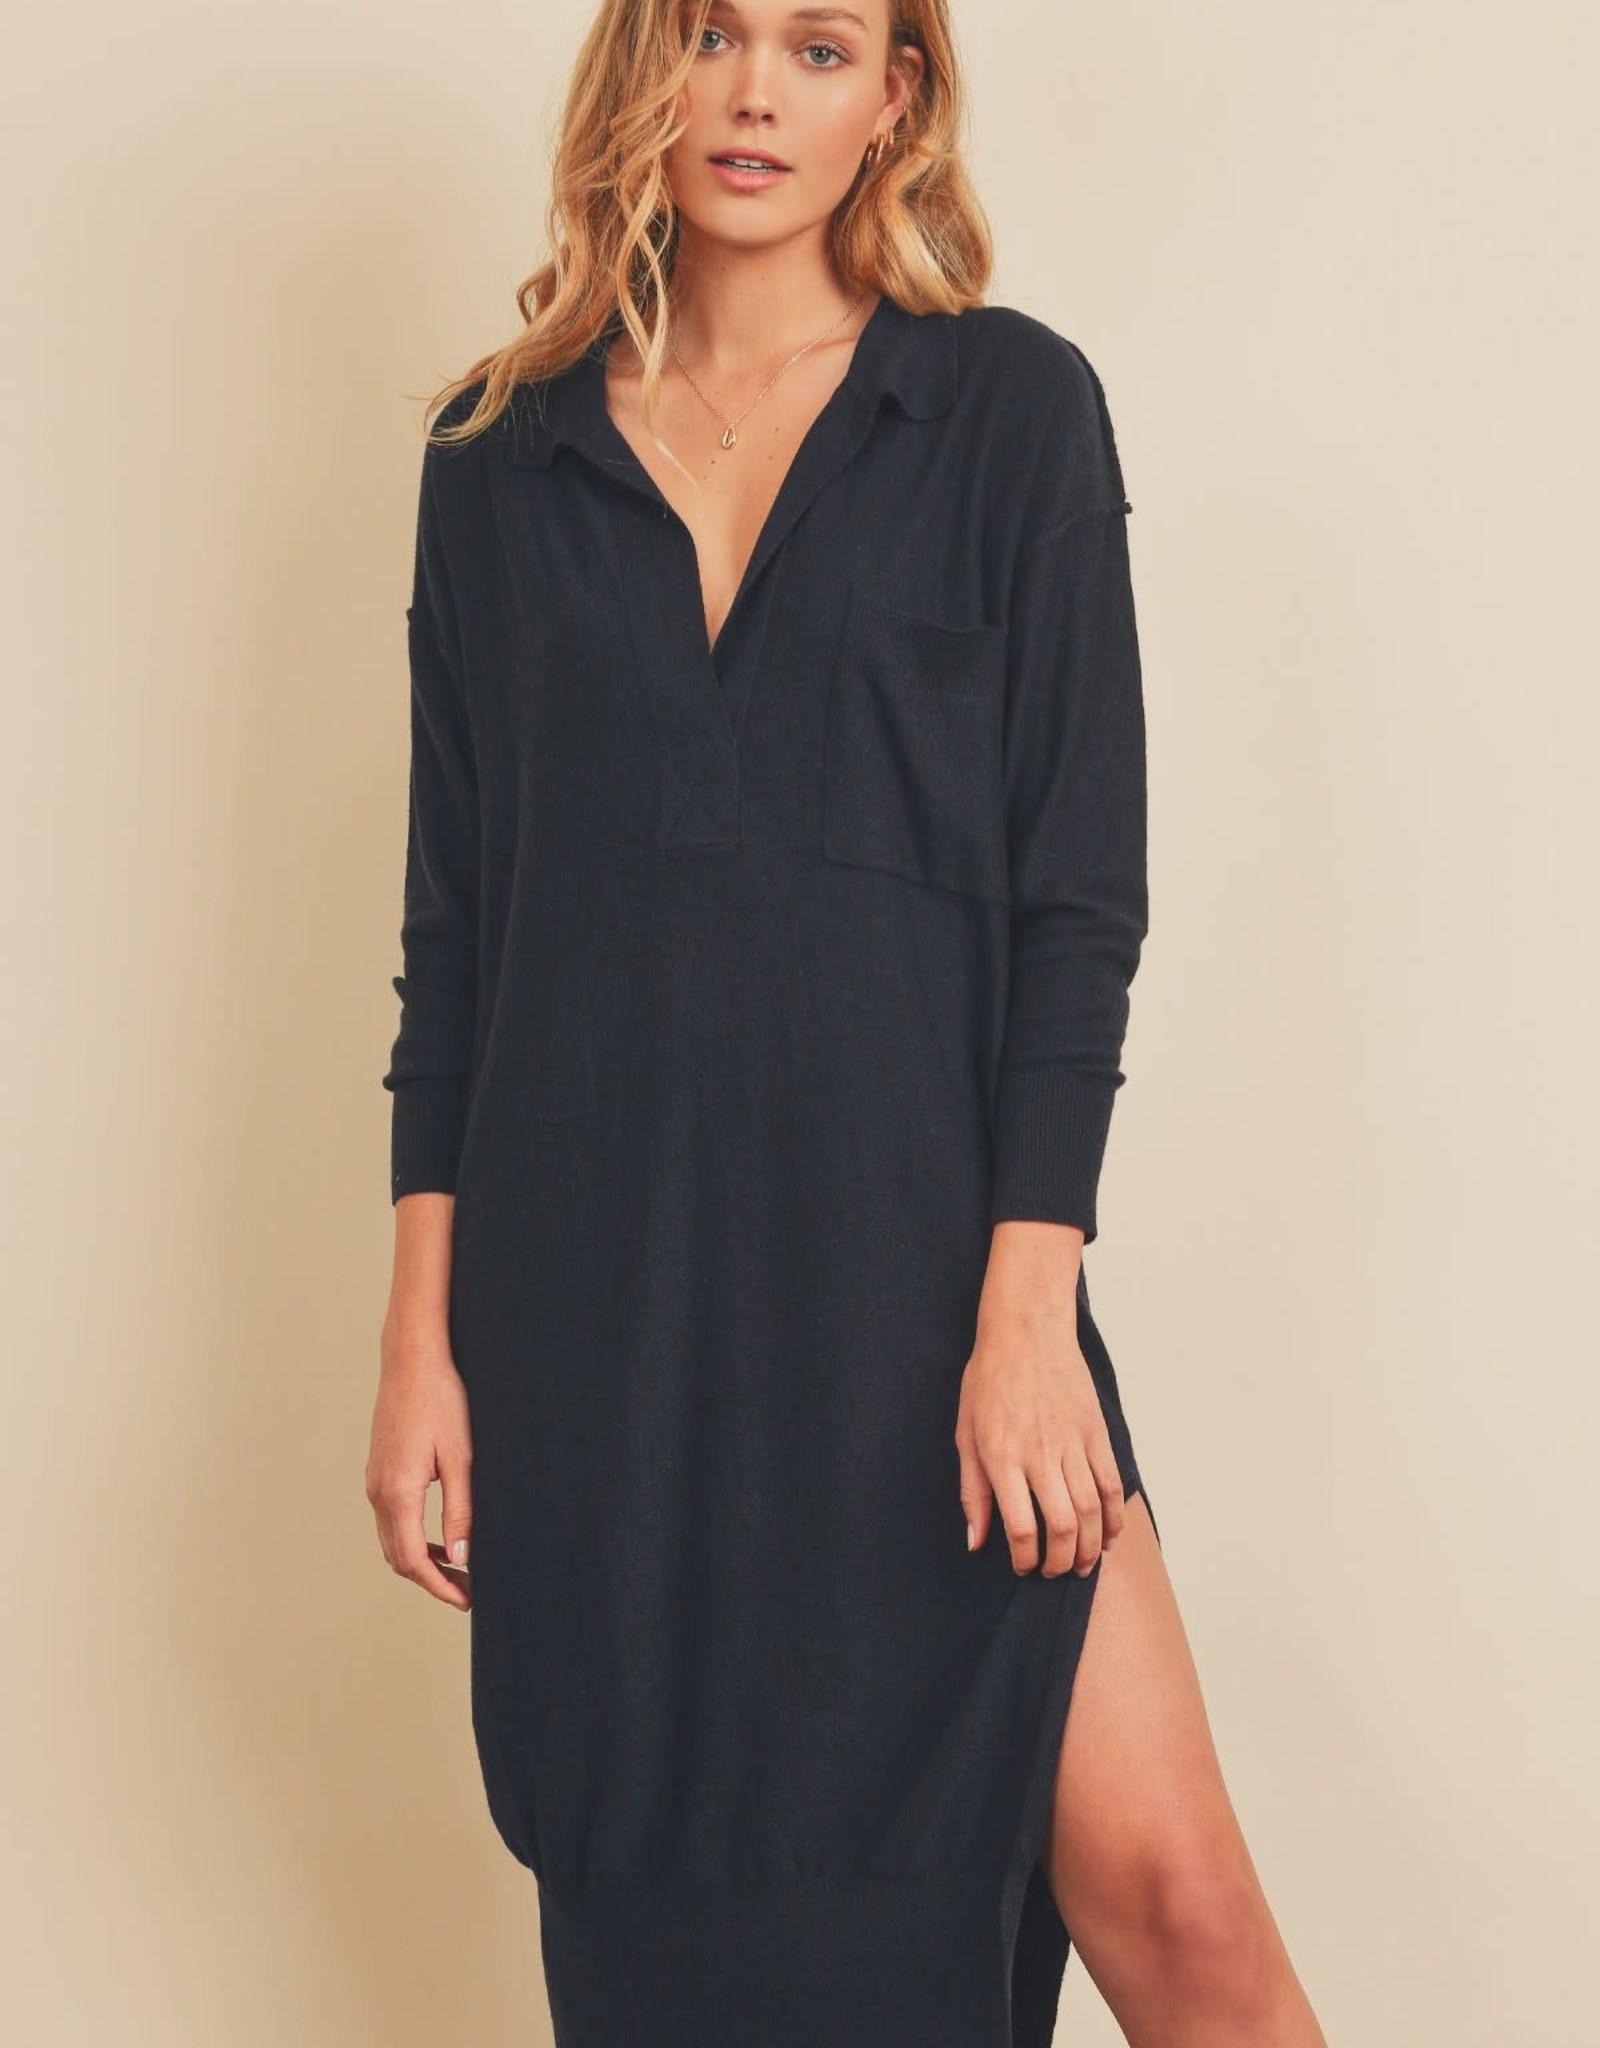 Miss Bliss Knit Polo Pocket Midi Dress- Navy